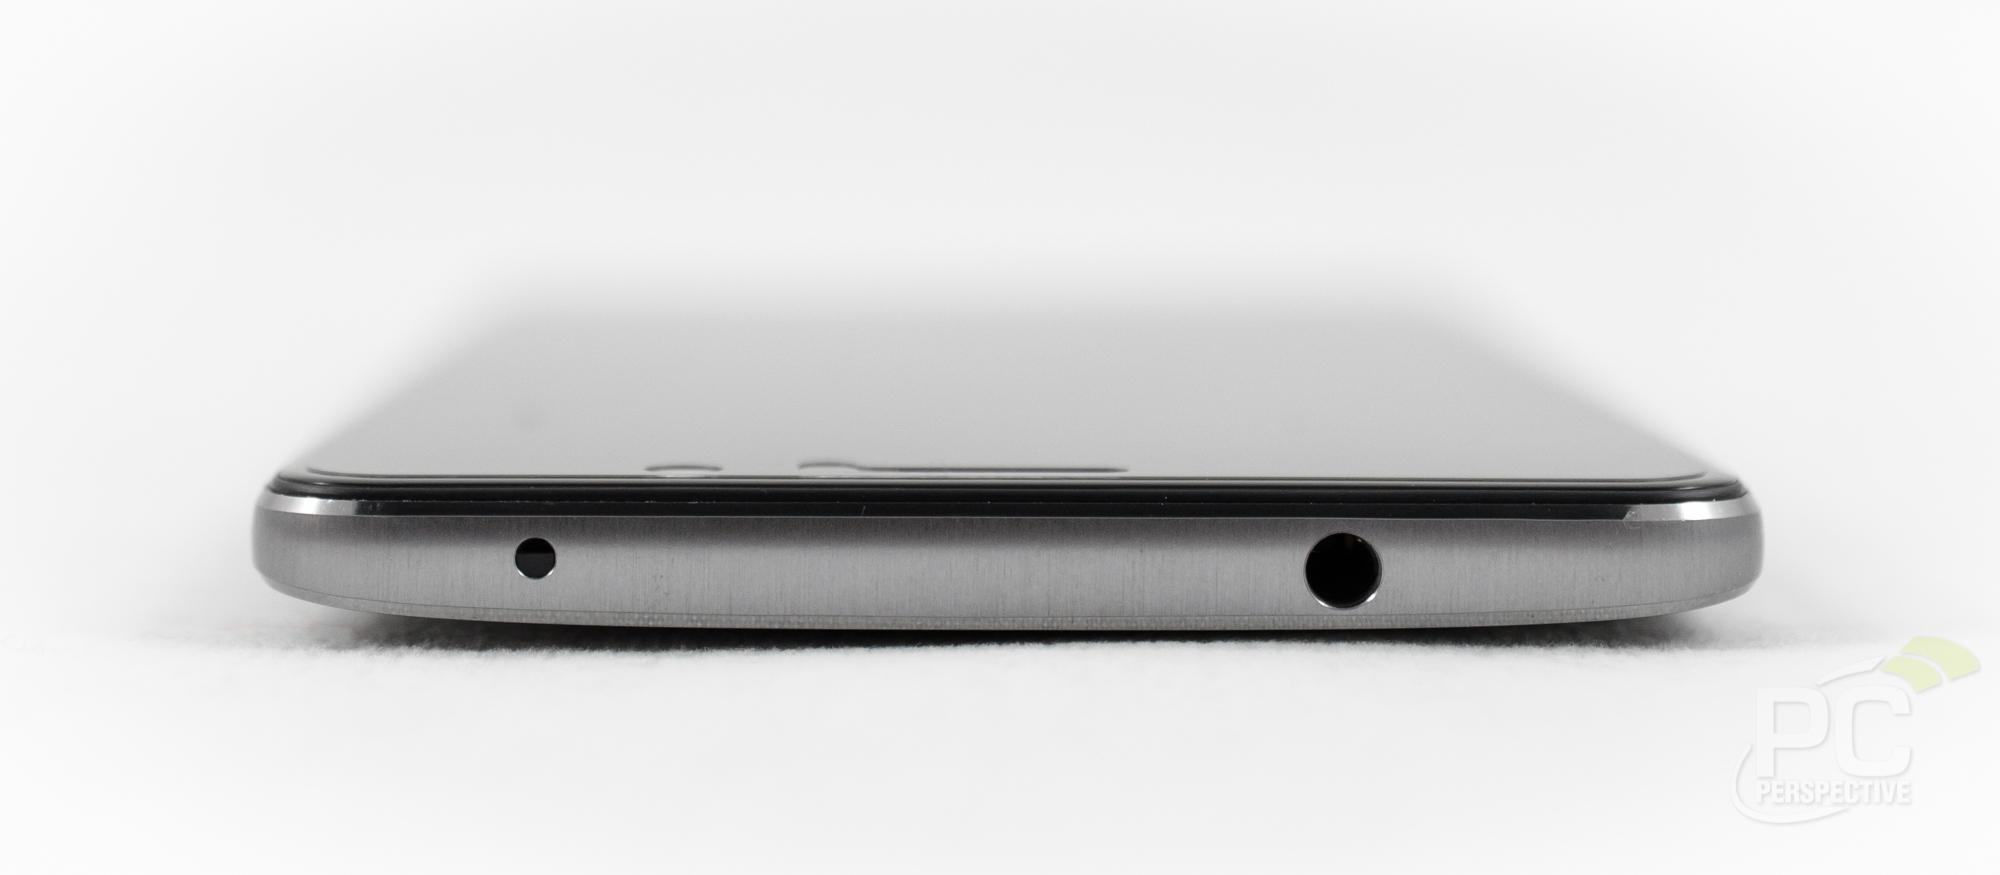 dsc-0594-0.jpg